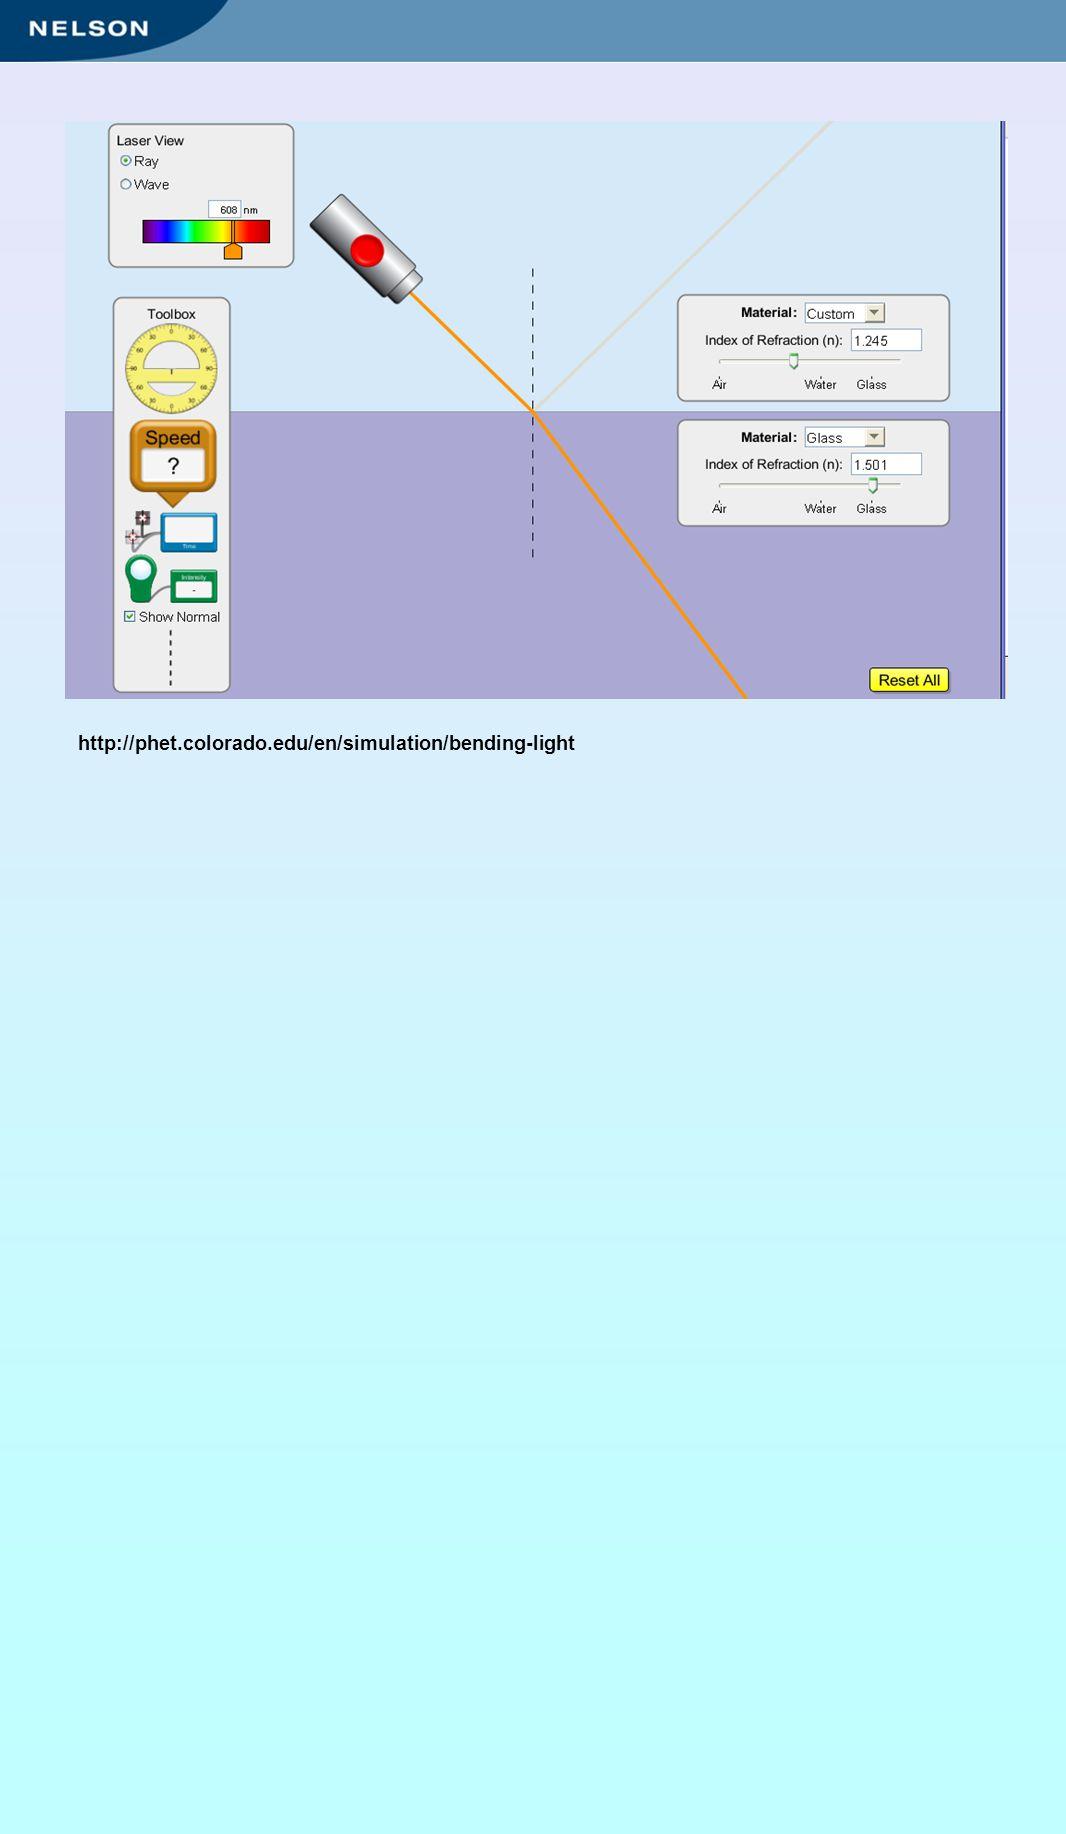 http://phet.colorado.edu/en/simulation/bending-light